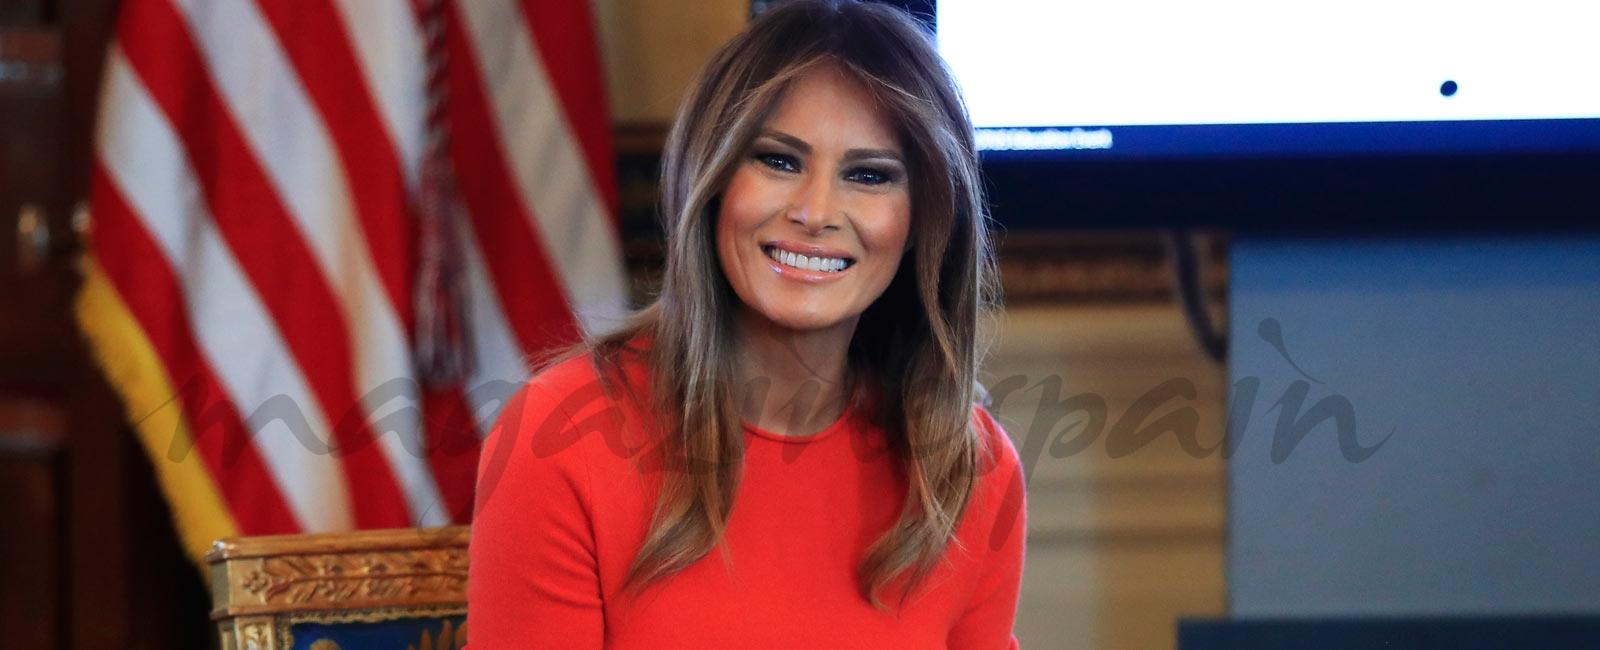 Así eran, Así son: Melania Trump 2008-2018